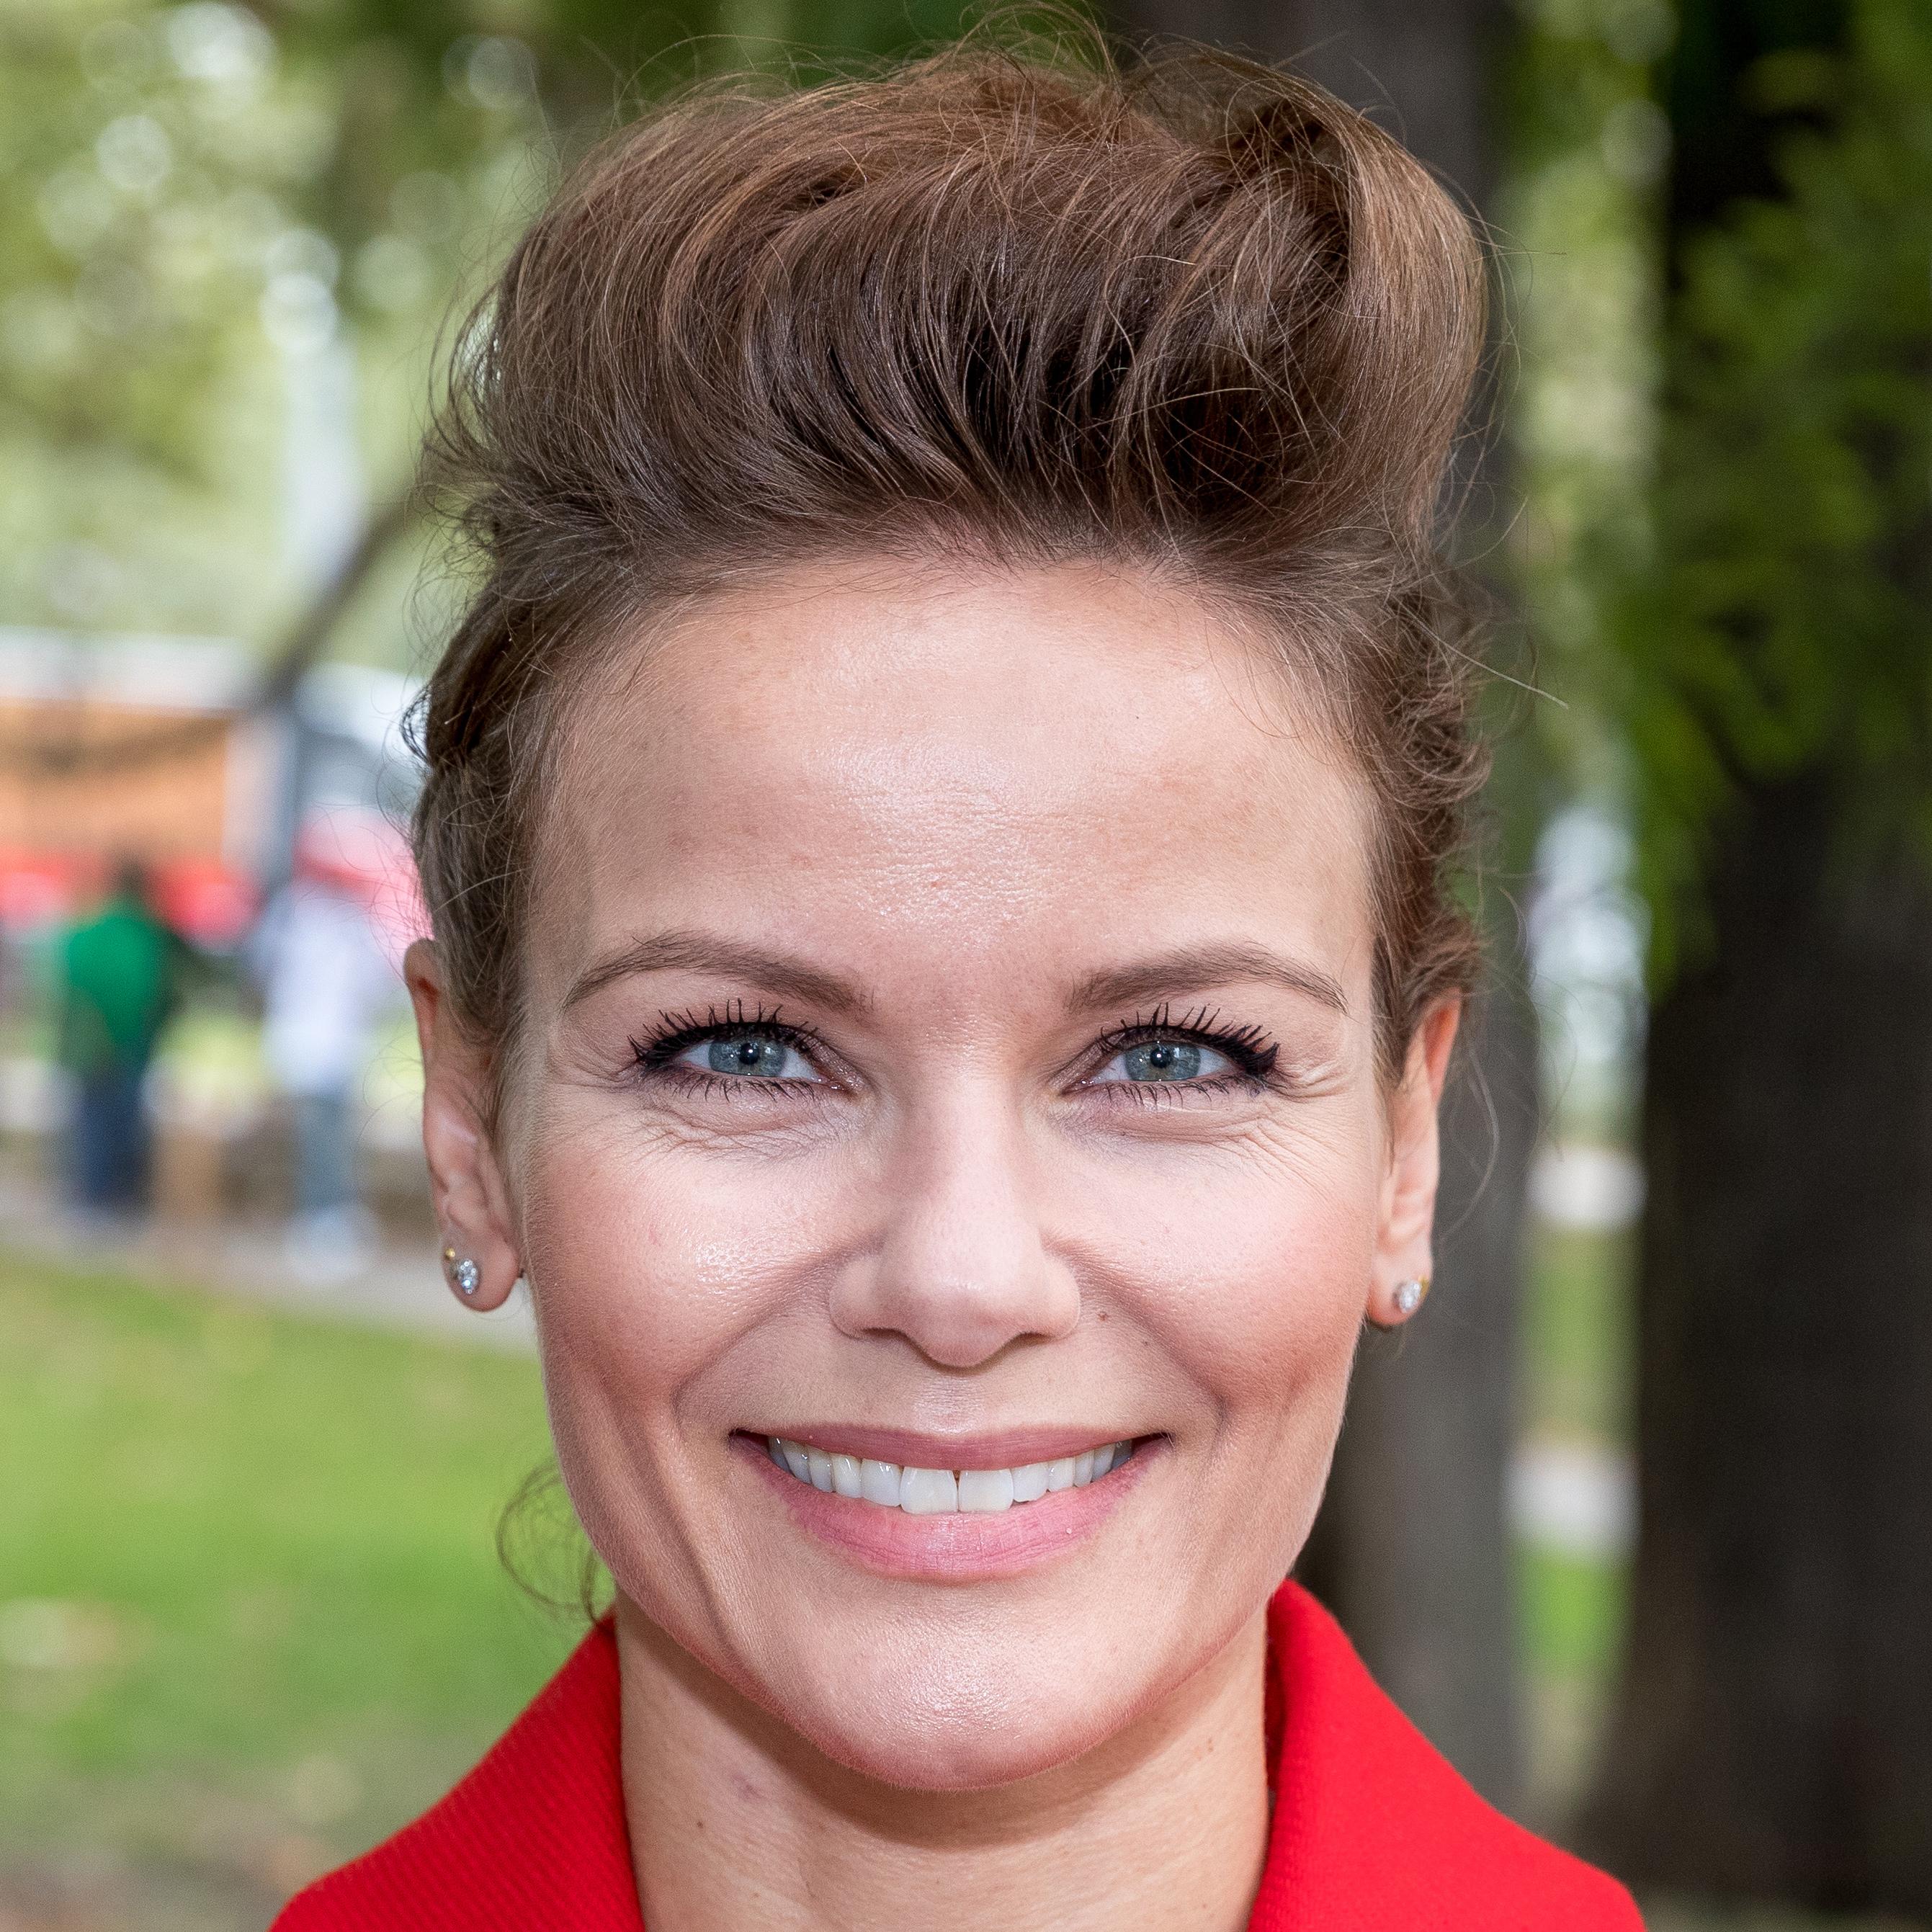 Angela Schijf Sexy angela schijf   rtl nieuws